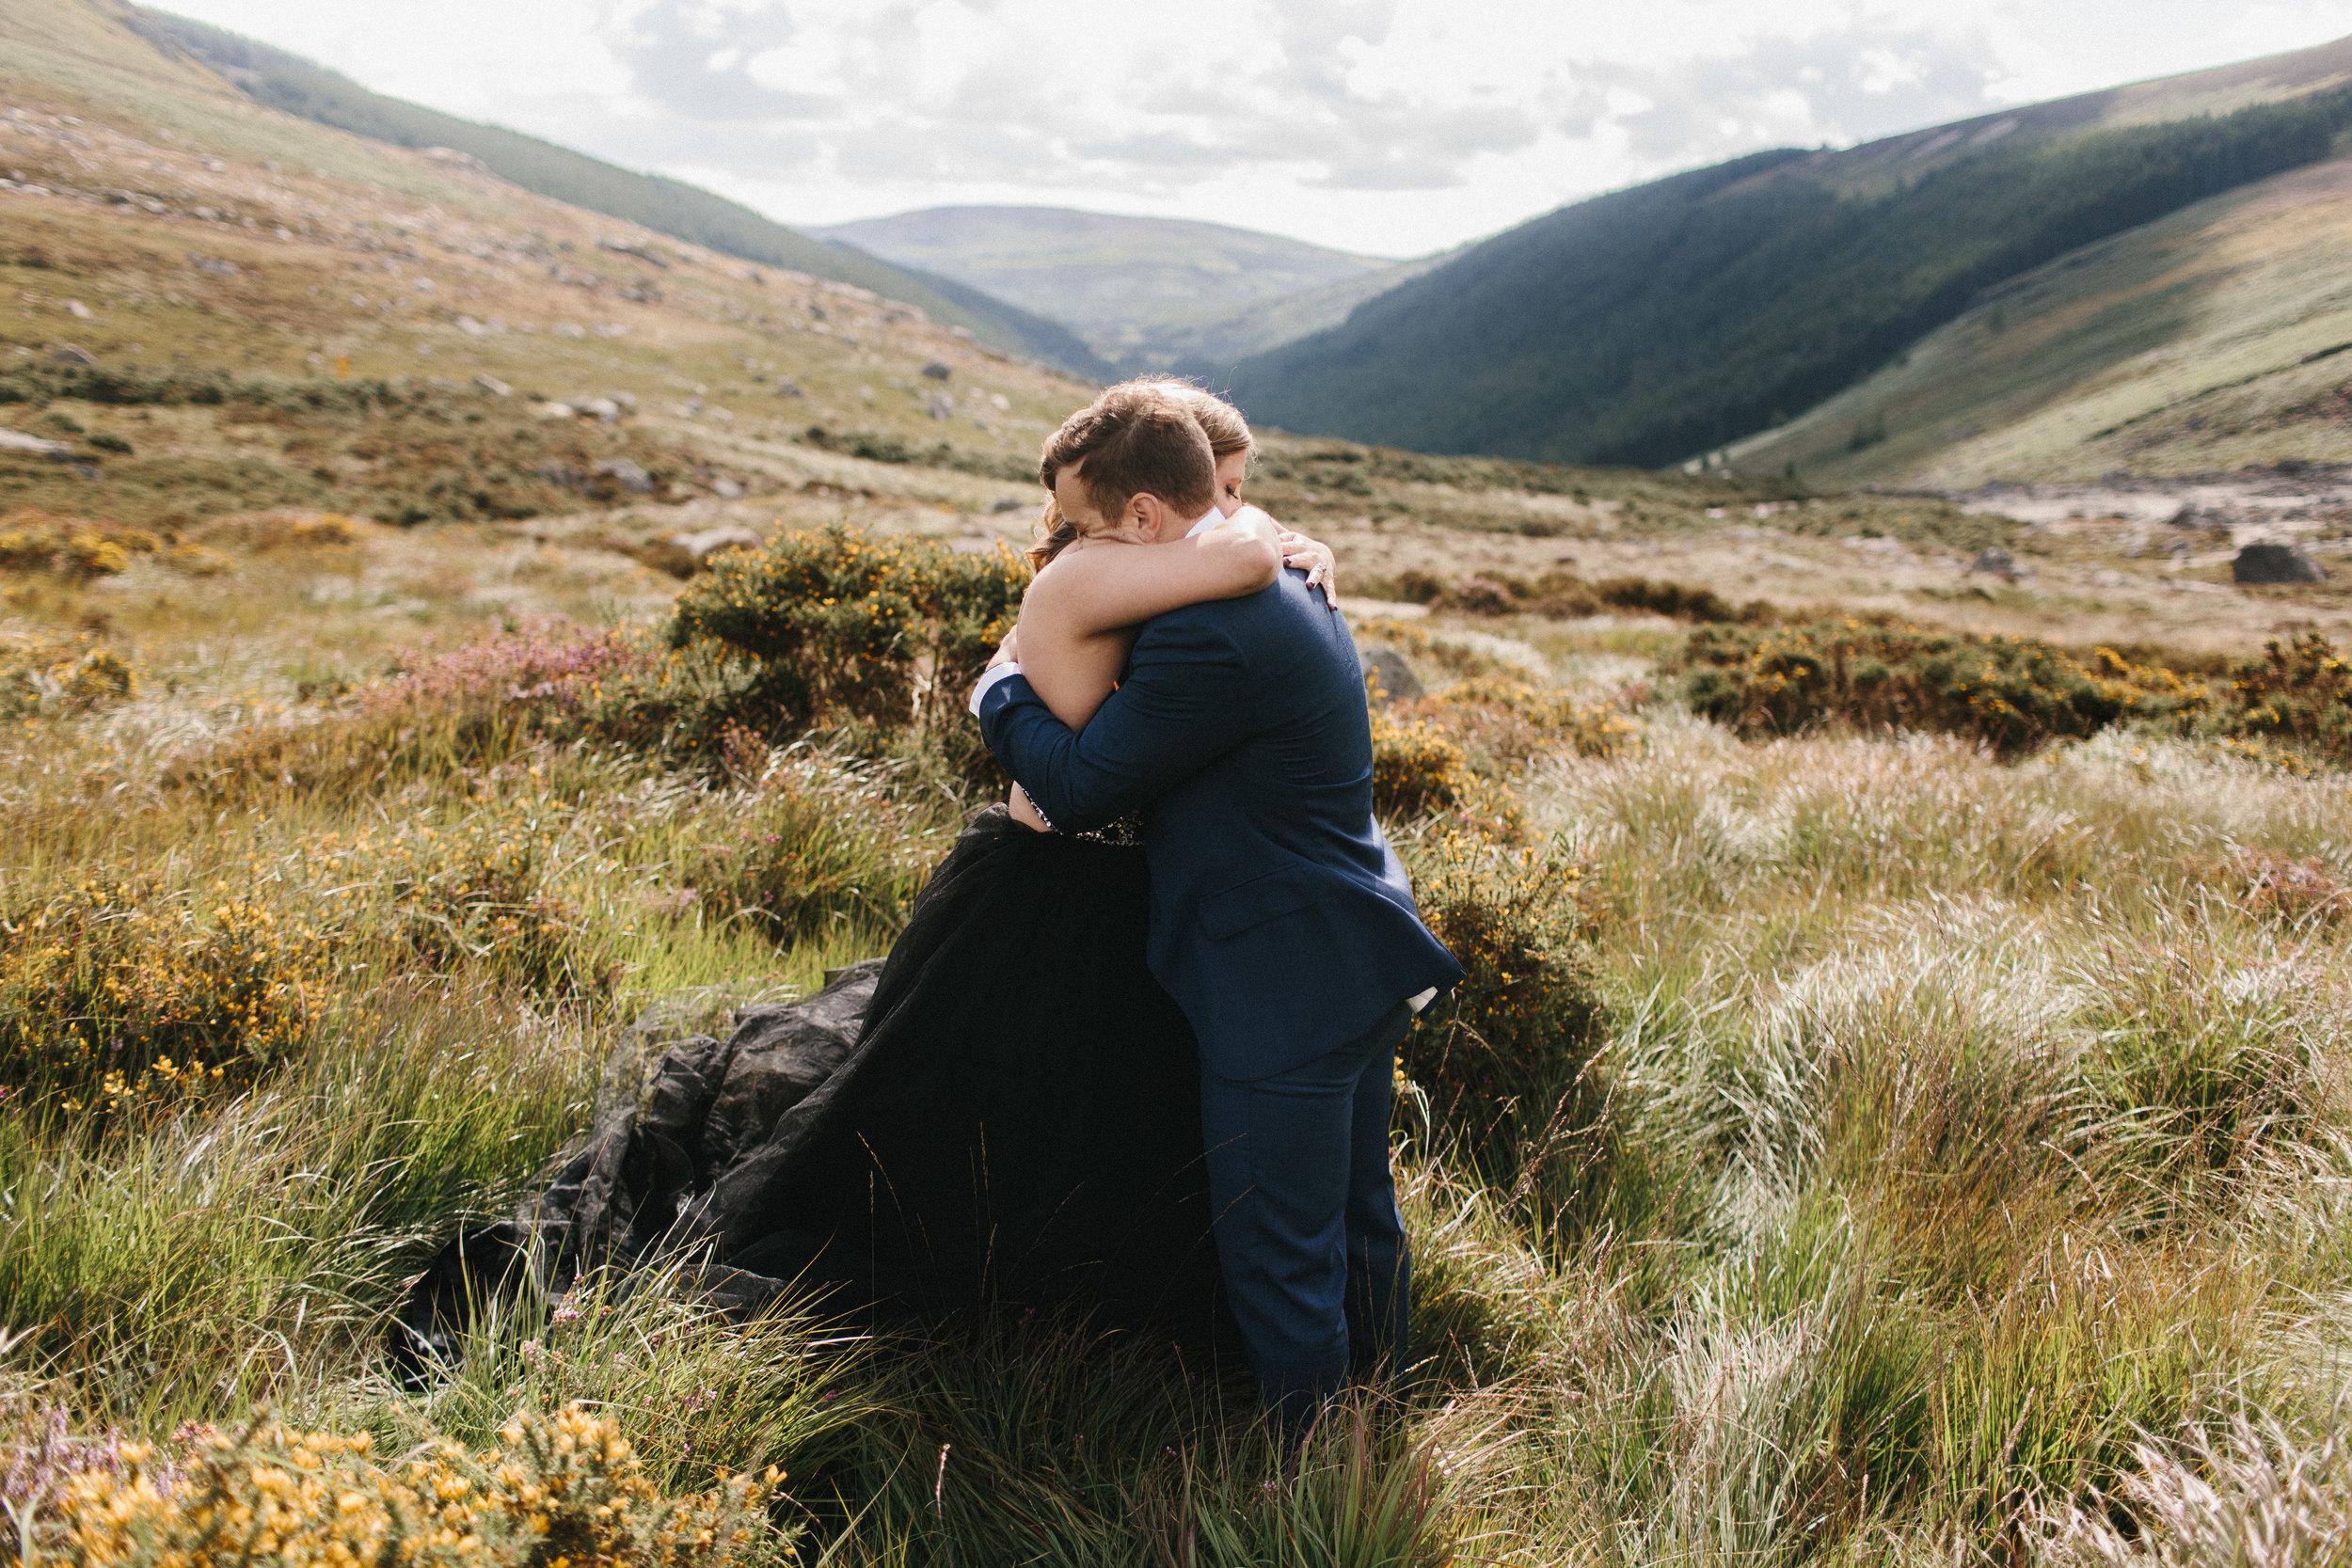 ireland_elopement_black_wedding_dress_wicklow_glendalough_athy_st_kevins_way_1243.jpg